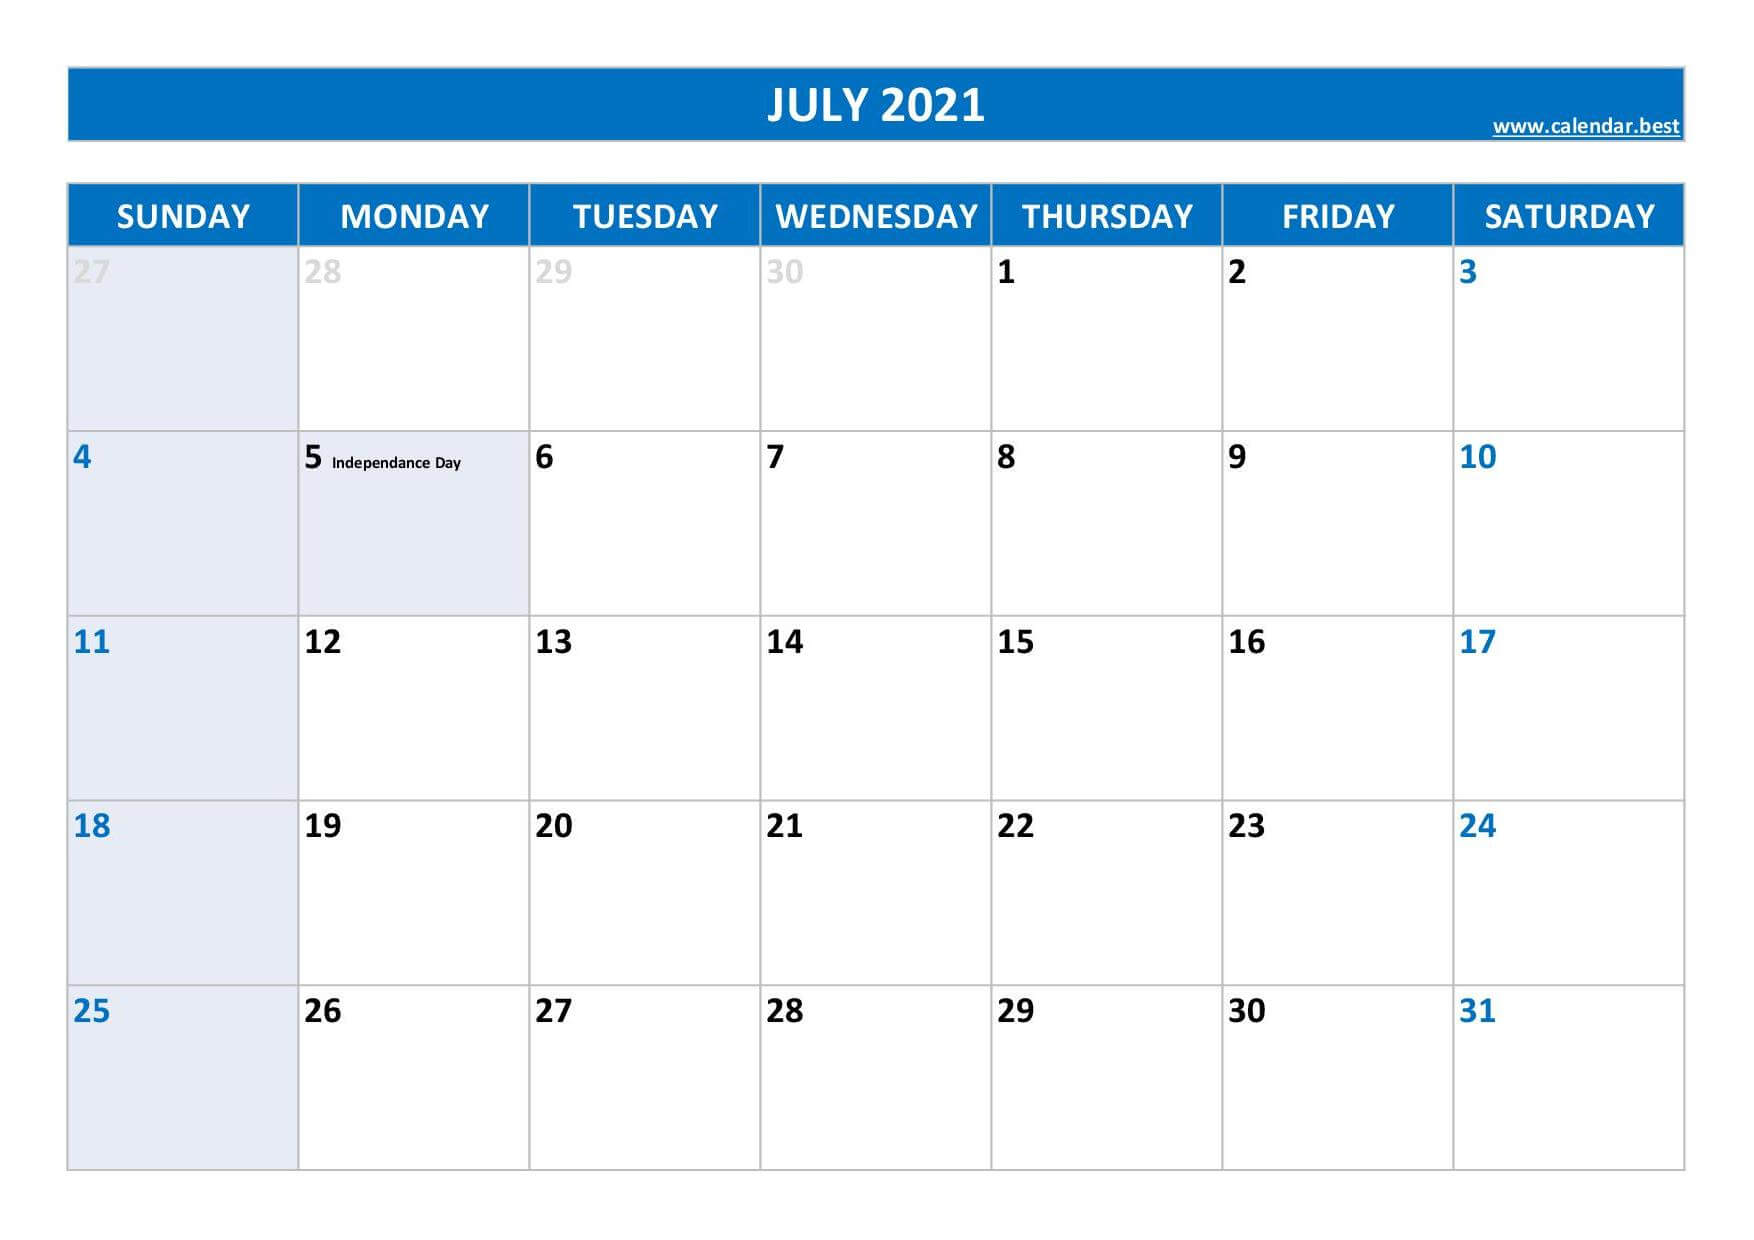 July 2021 calendar to print